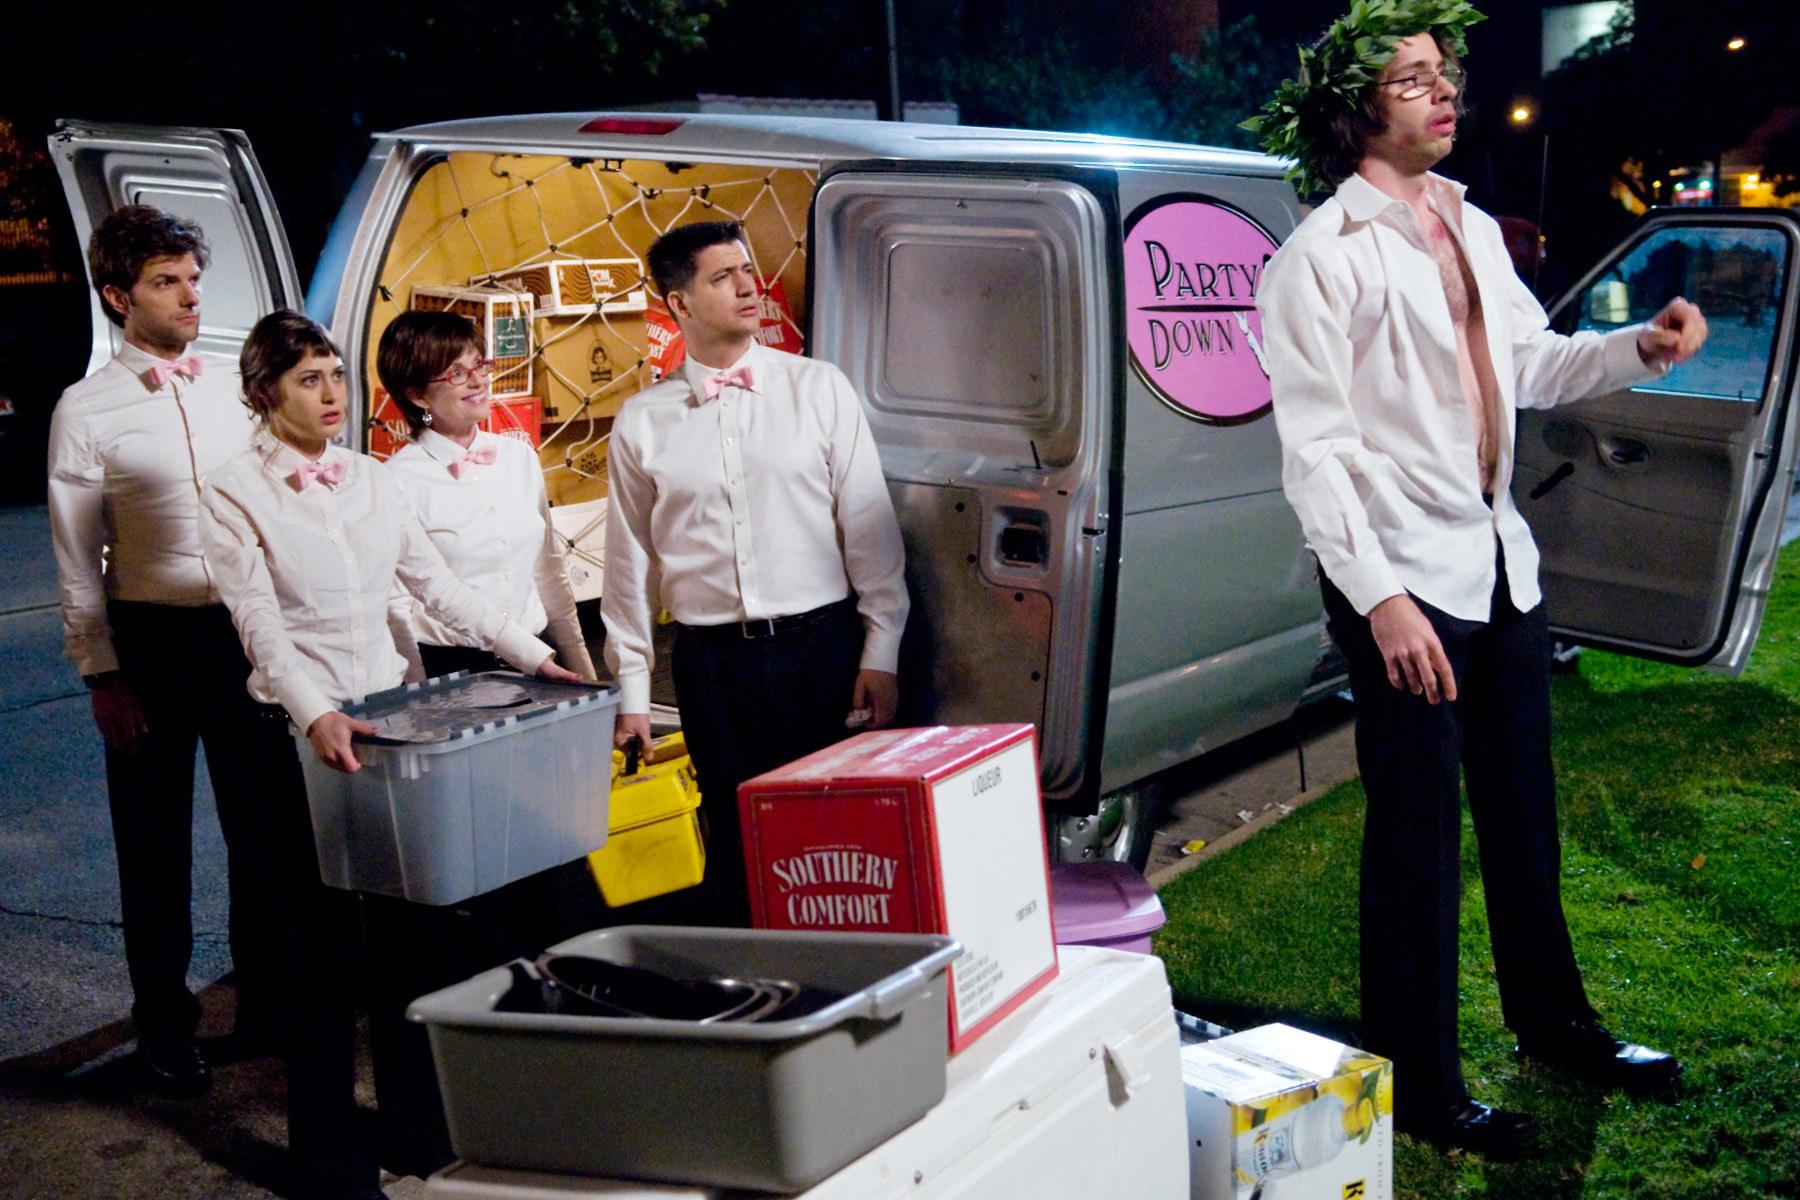 Adam Scott, Lizzy Caplan, Megan Mullally, Ken Marino, and Martin Starr stand outside a catering truck.